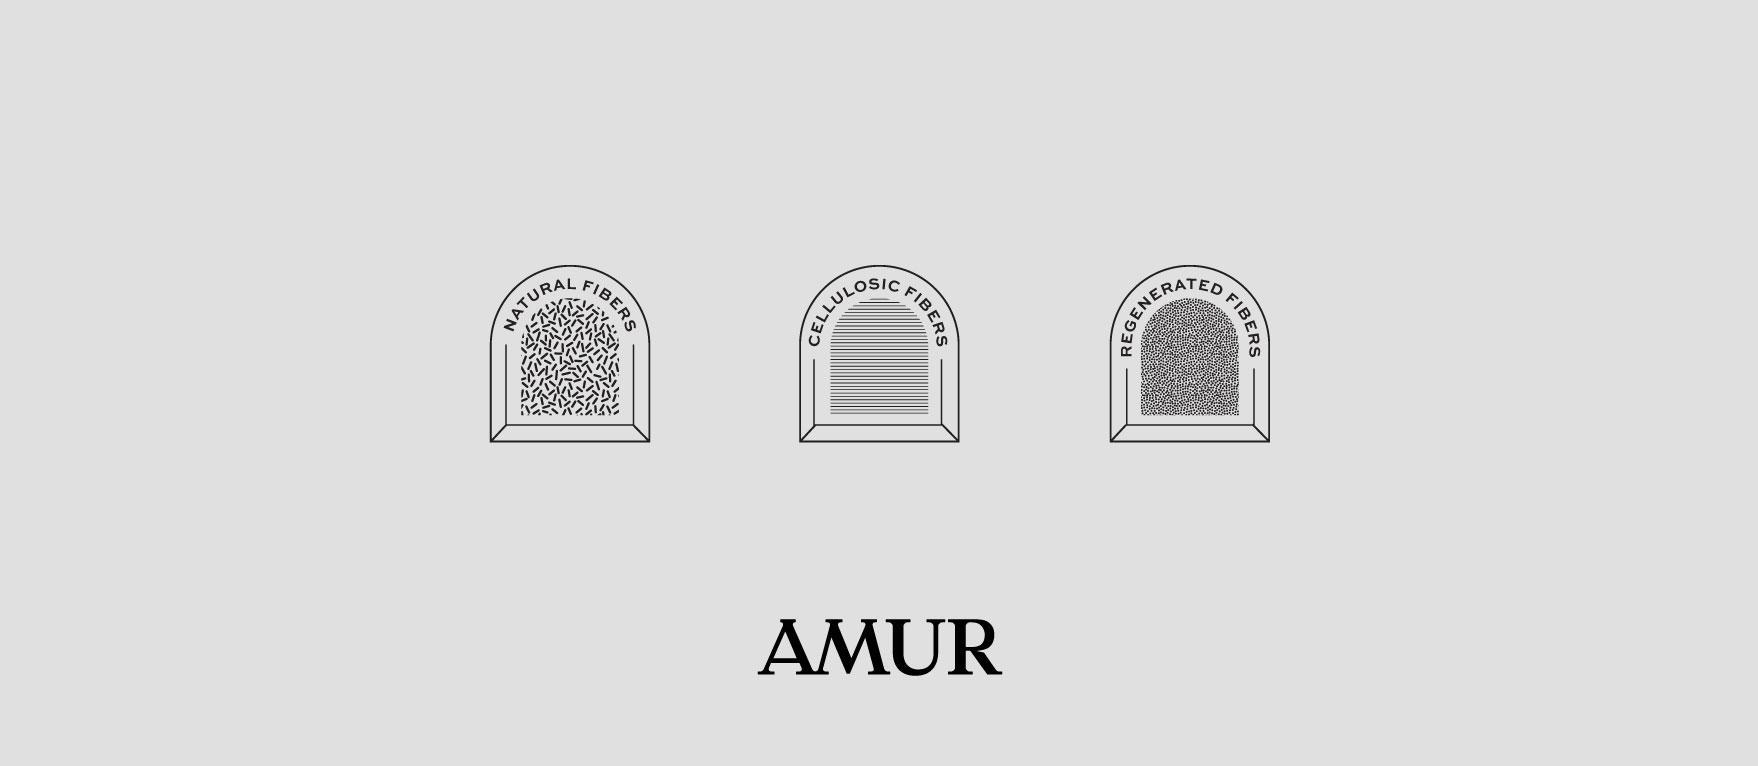 Amur_Icons_4